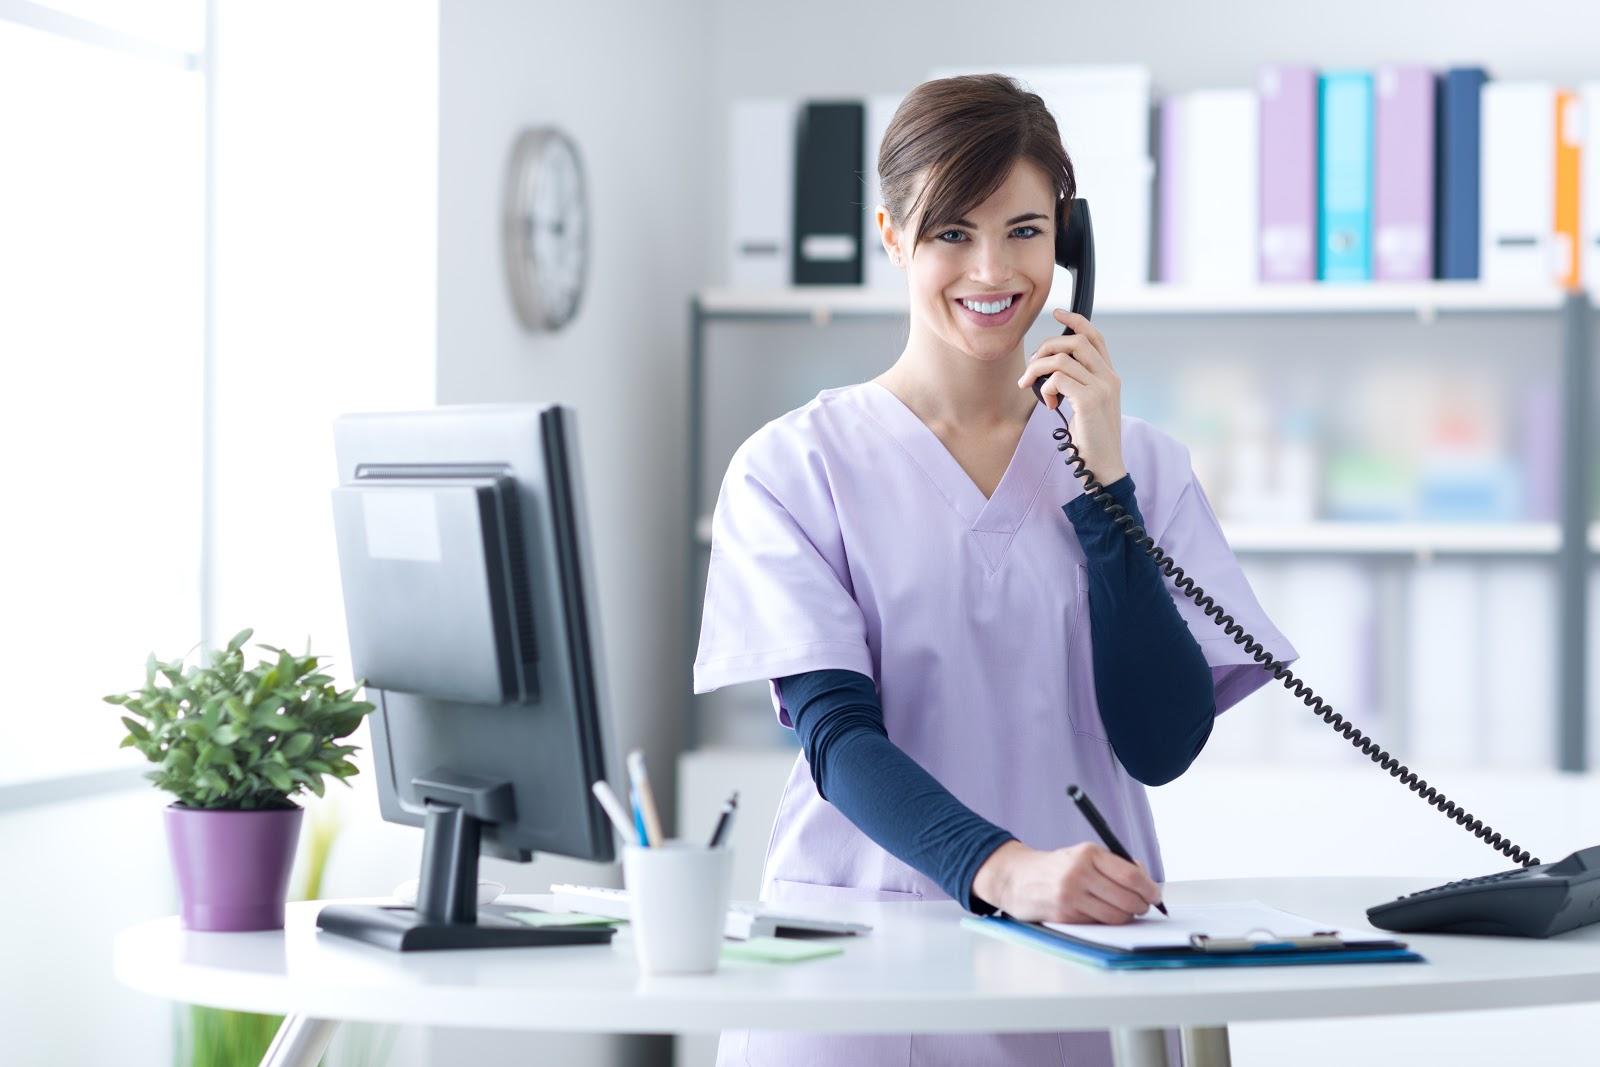 Receptionist smiling